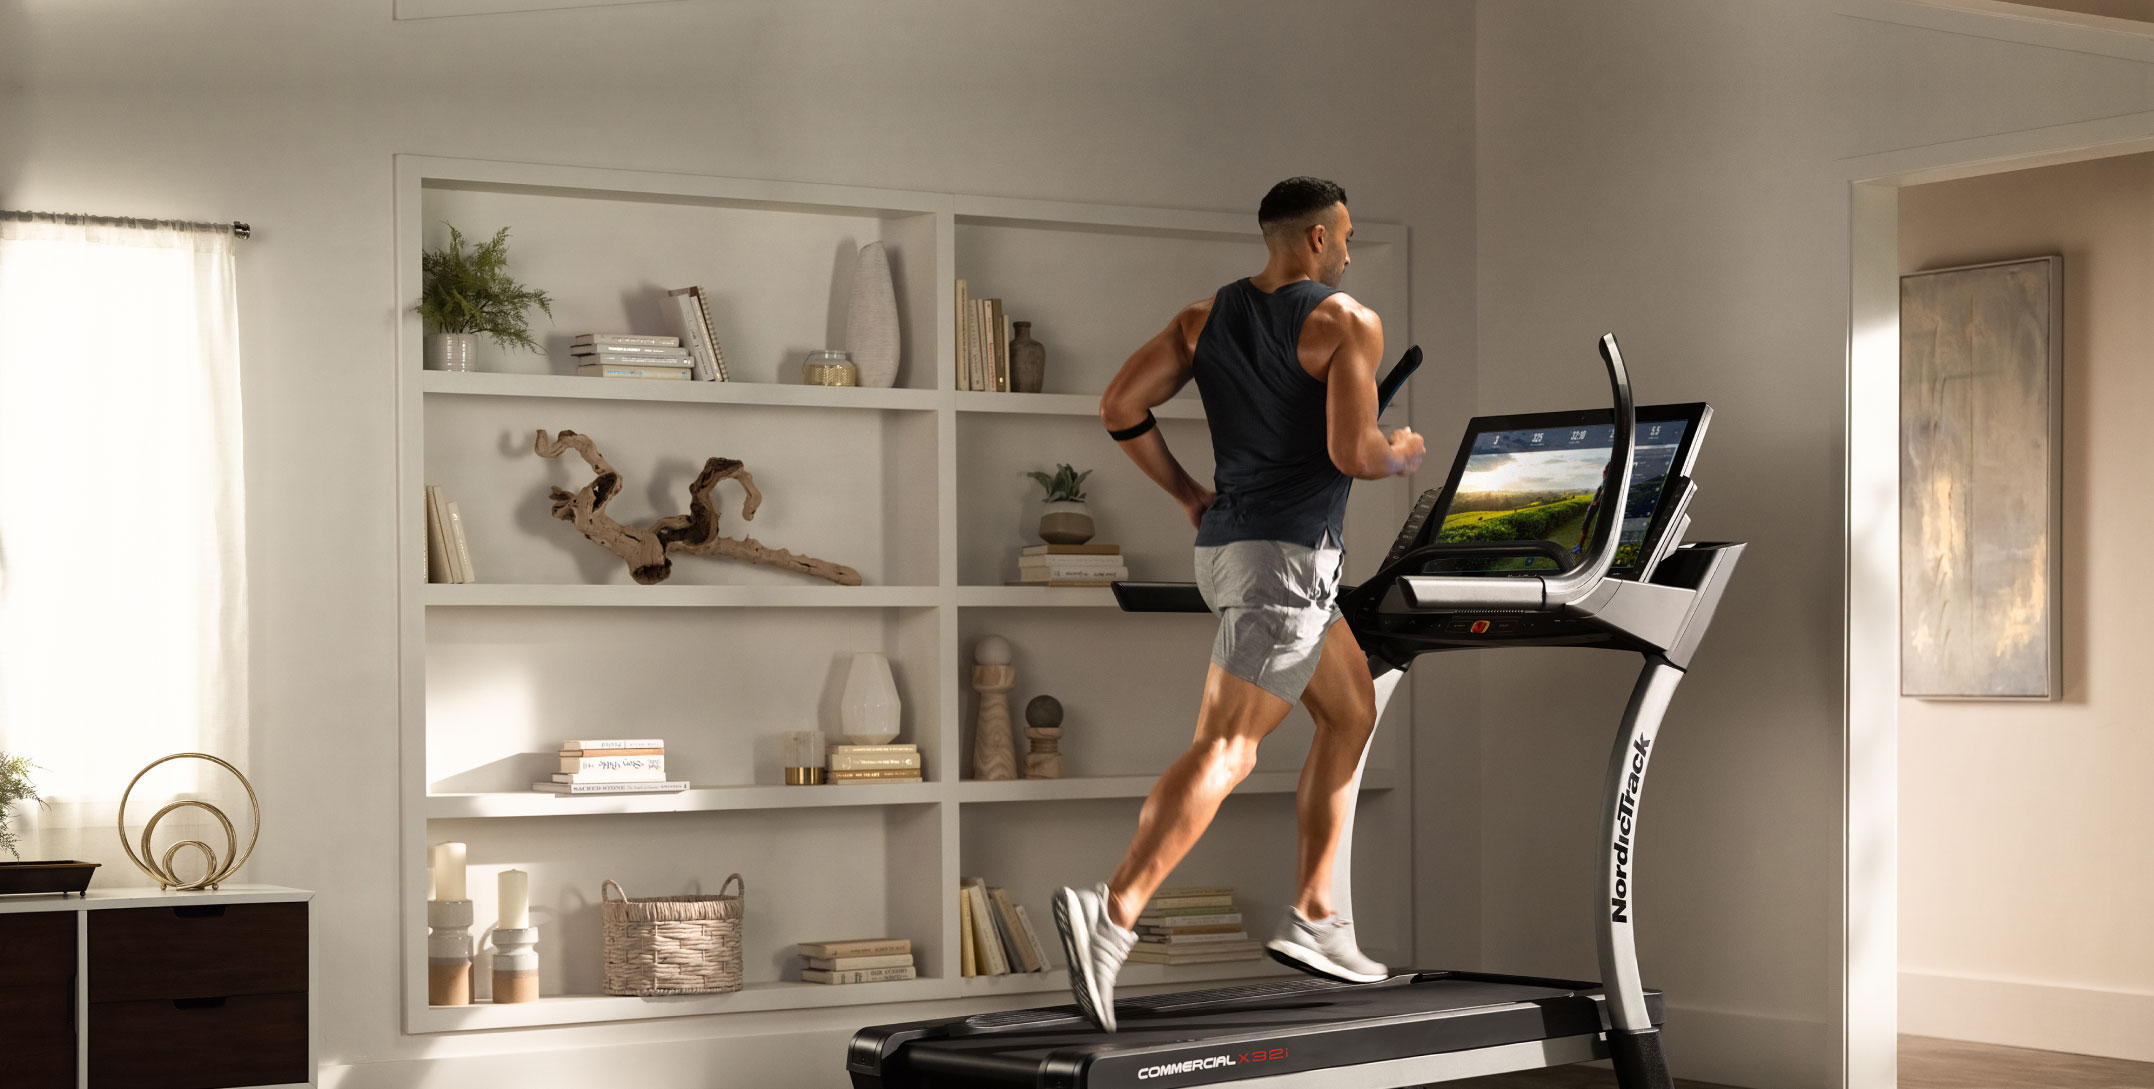 Man running on iFIT treadmill in front of bookshelf